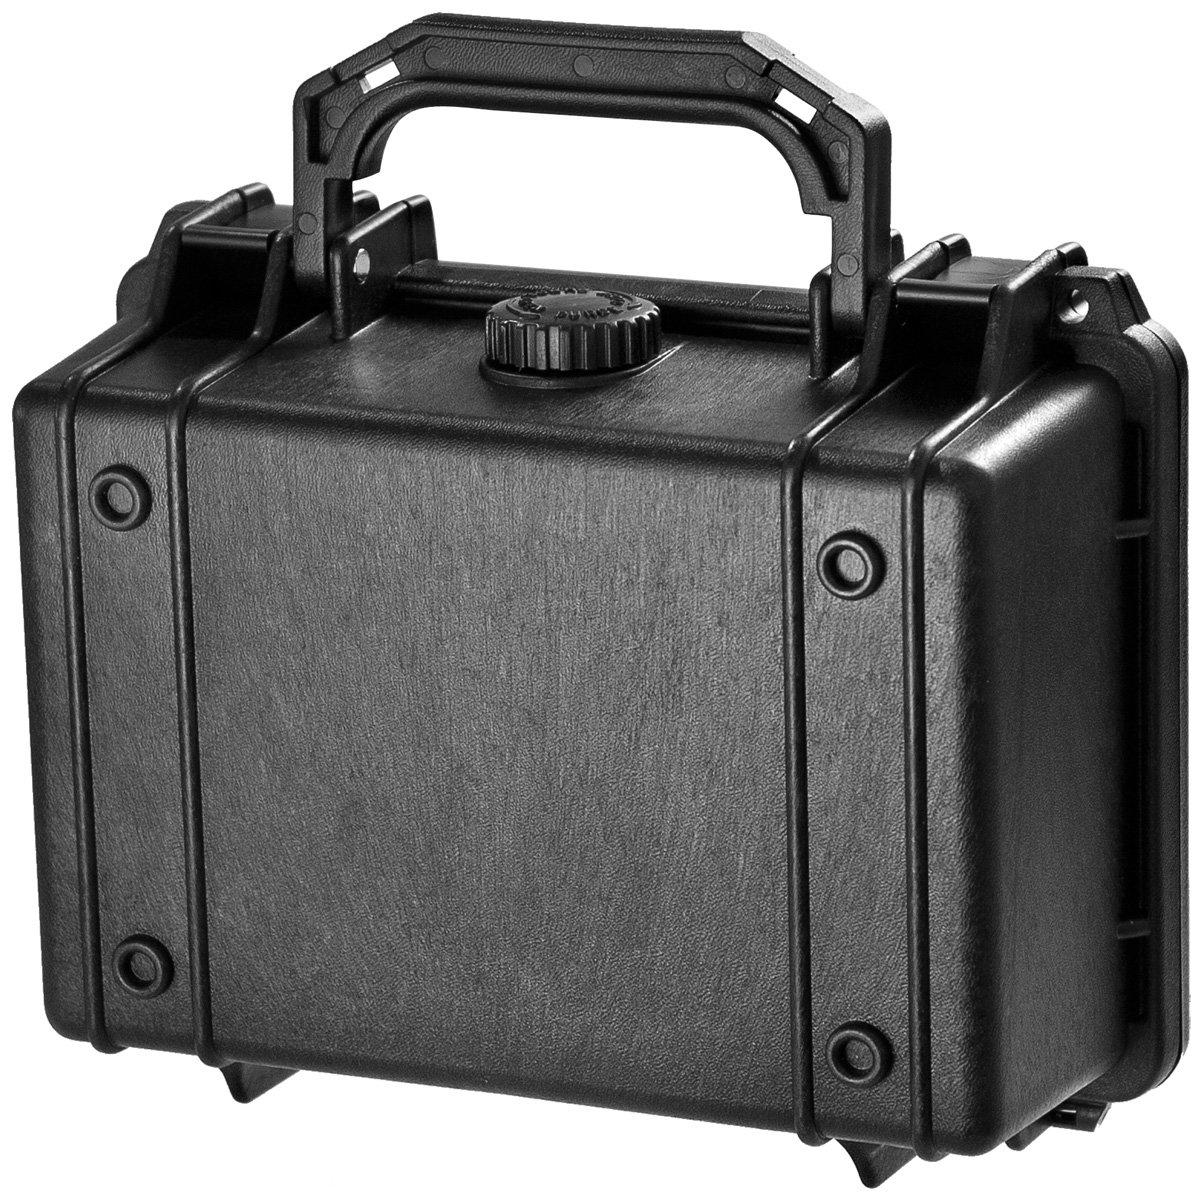 Loaded Gear HD-100 Hard Case Black Medium by BARSKA BH11856